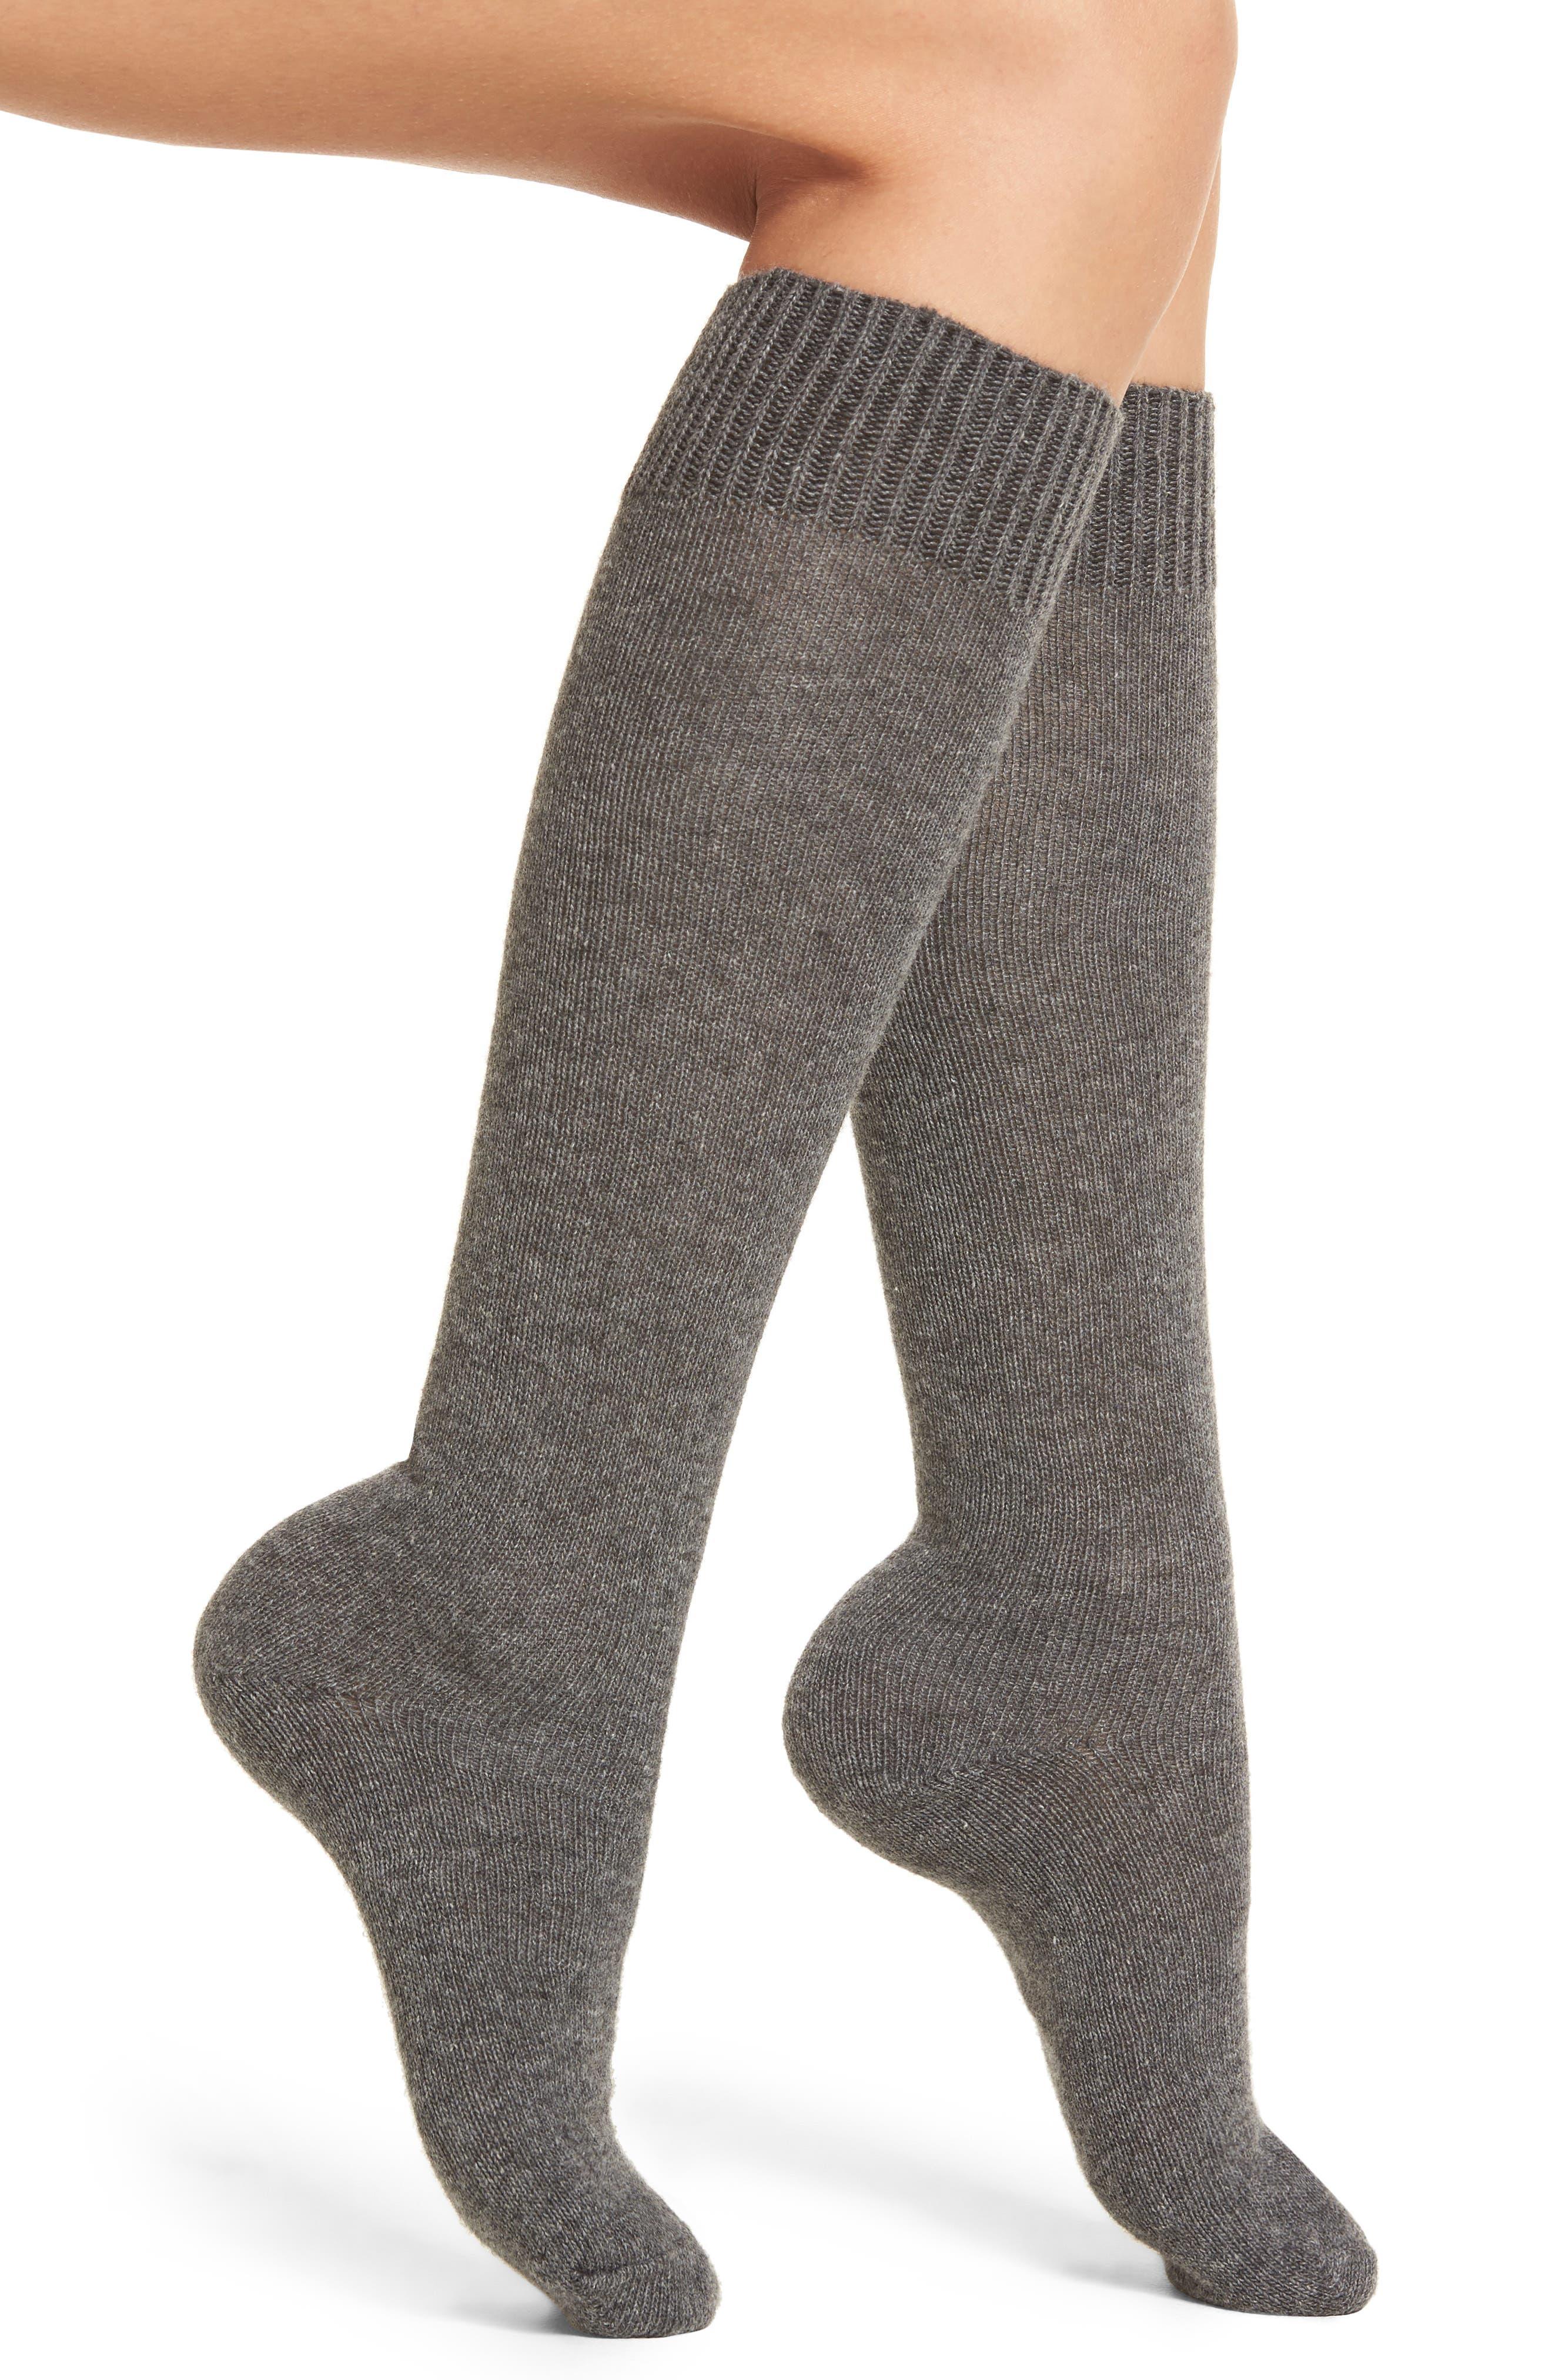 Knee High Socks,                         Main,                         color, Charcoal